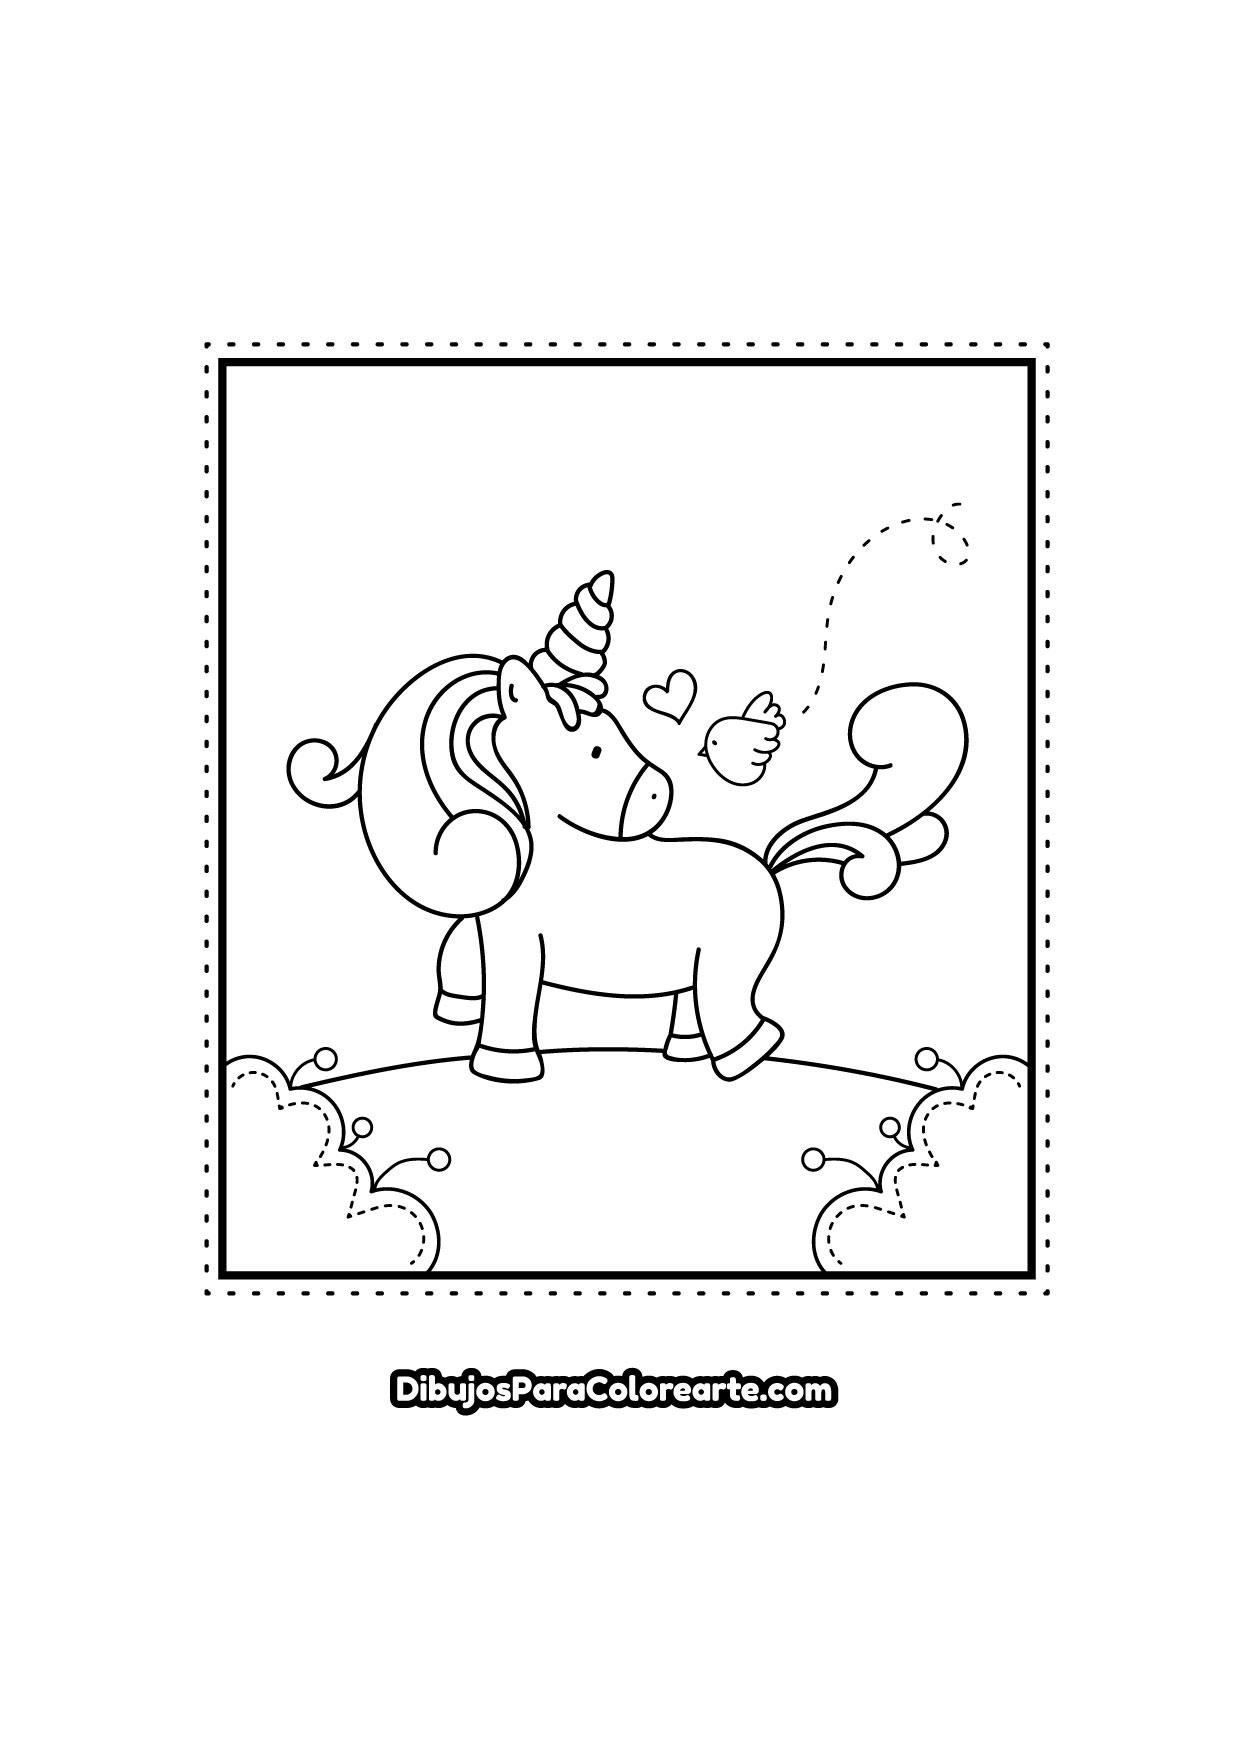 Colorear Dibujo De Unicornio Tierno